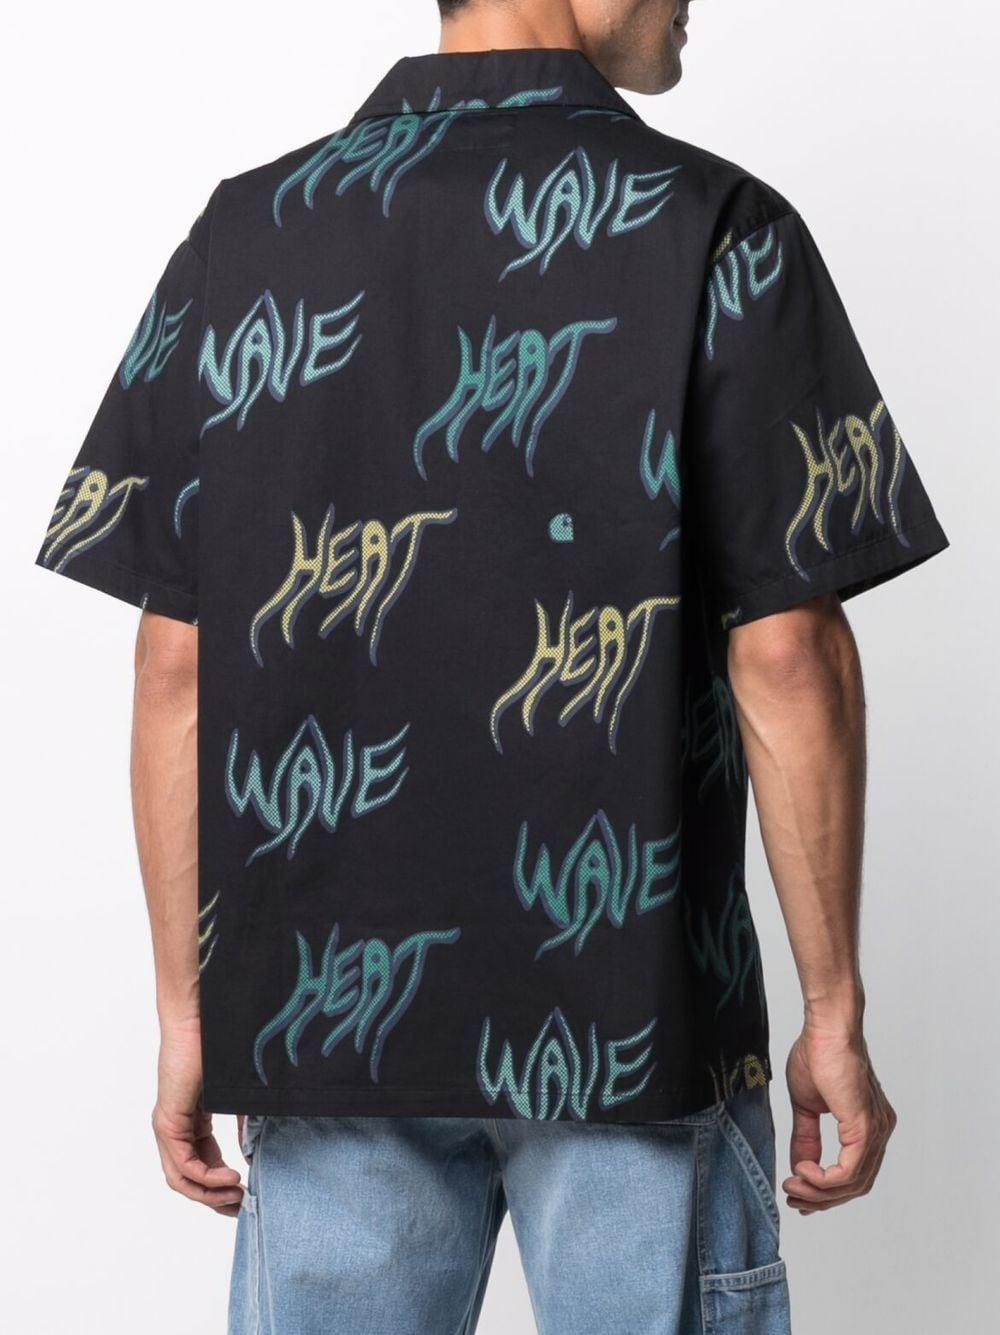 heat wave shirt man black in cotton CARHARTT WIP | Shirts | I0287990BN.00